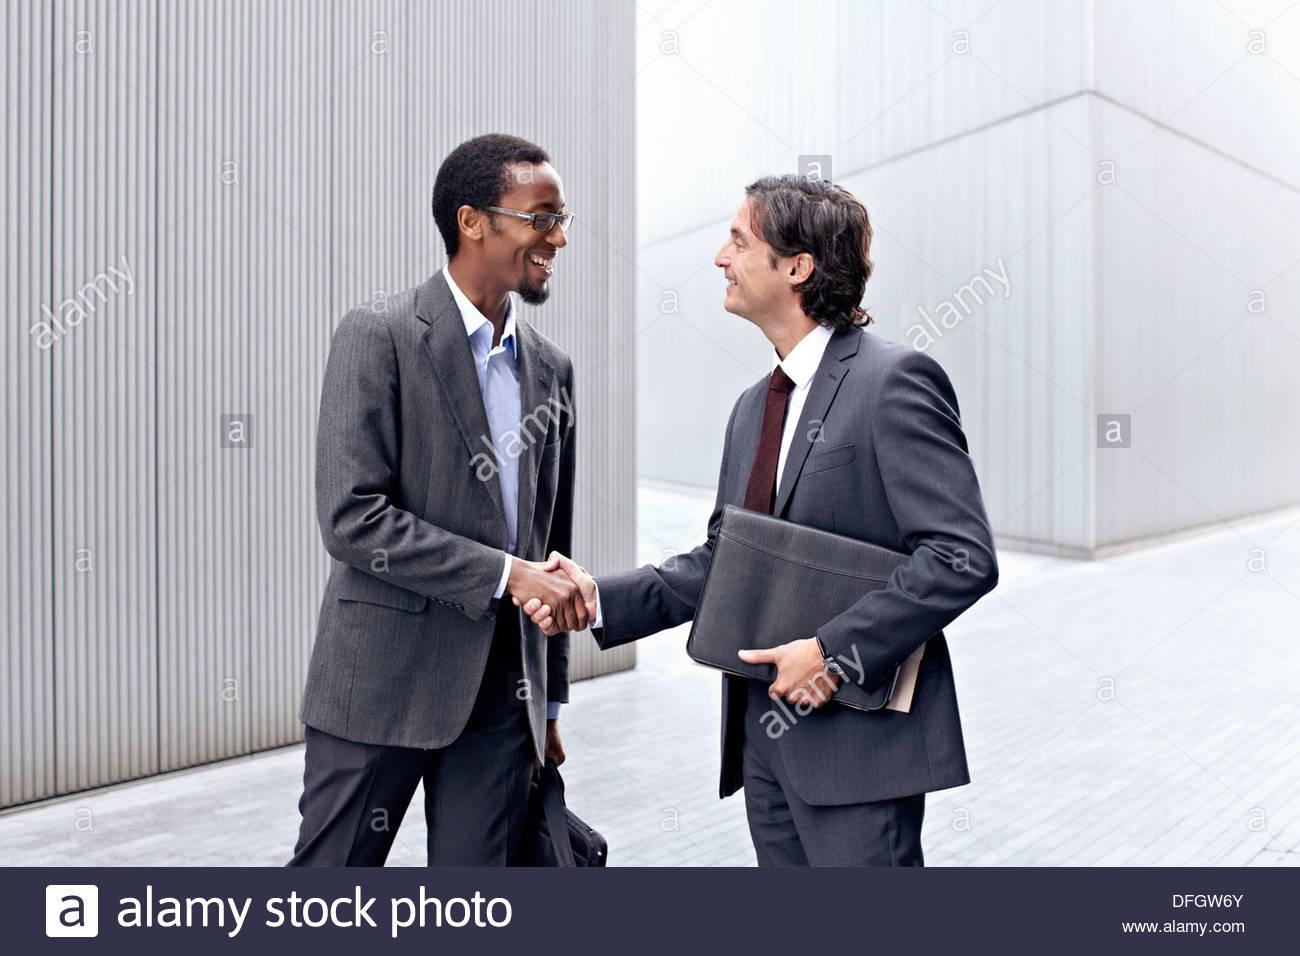 Businessmen handshaking - Stock Image